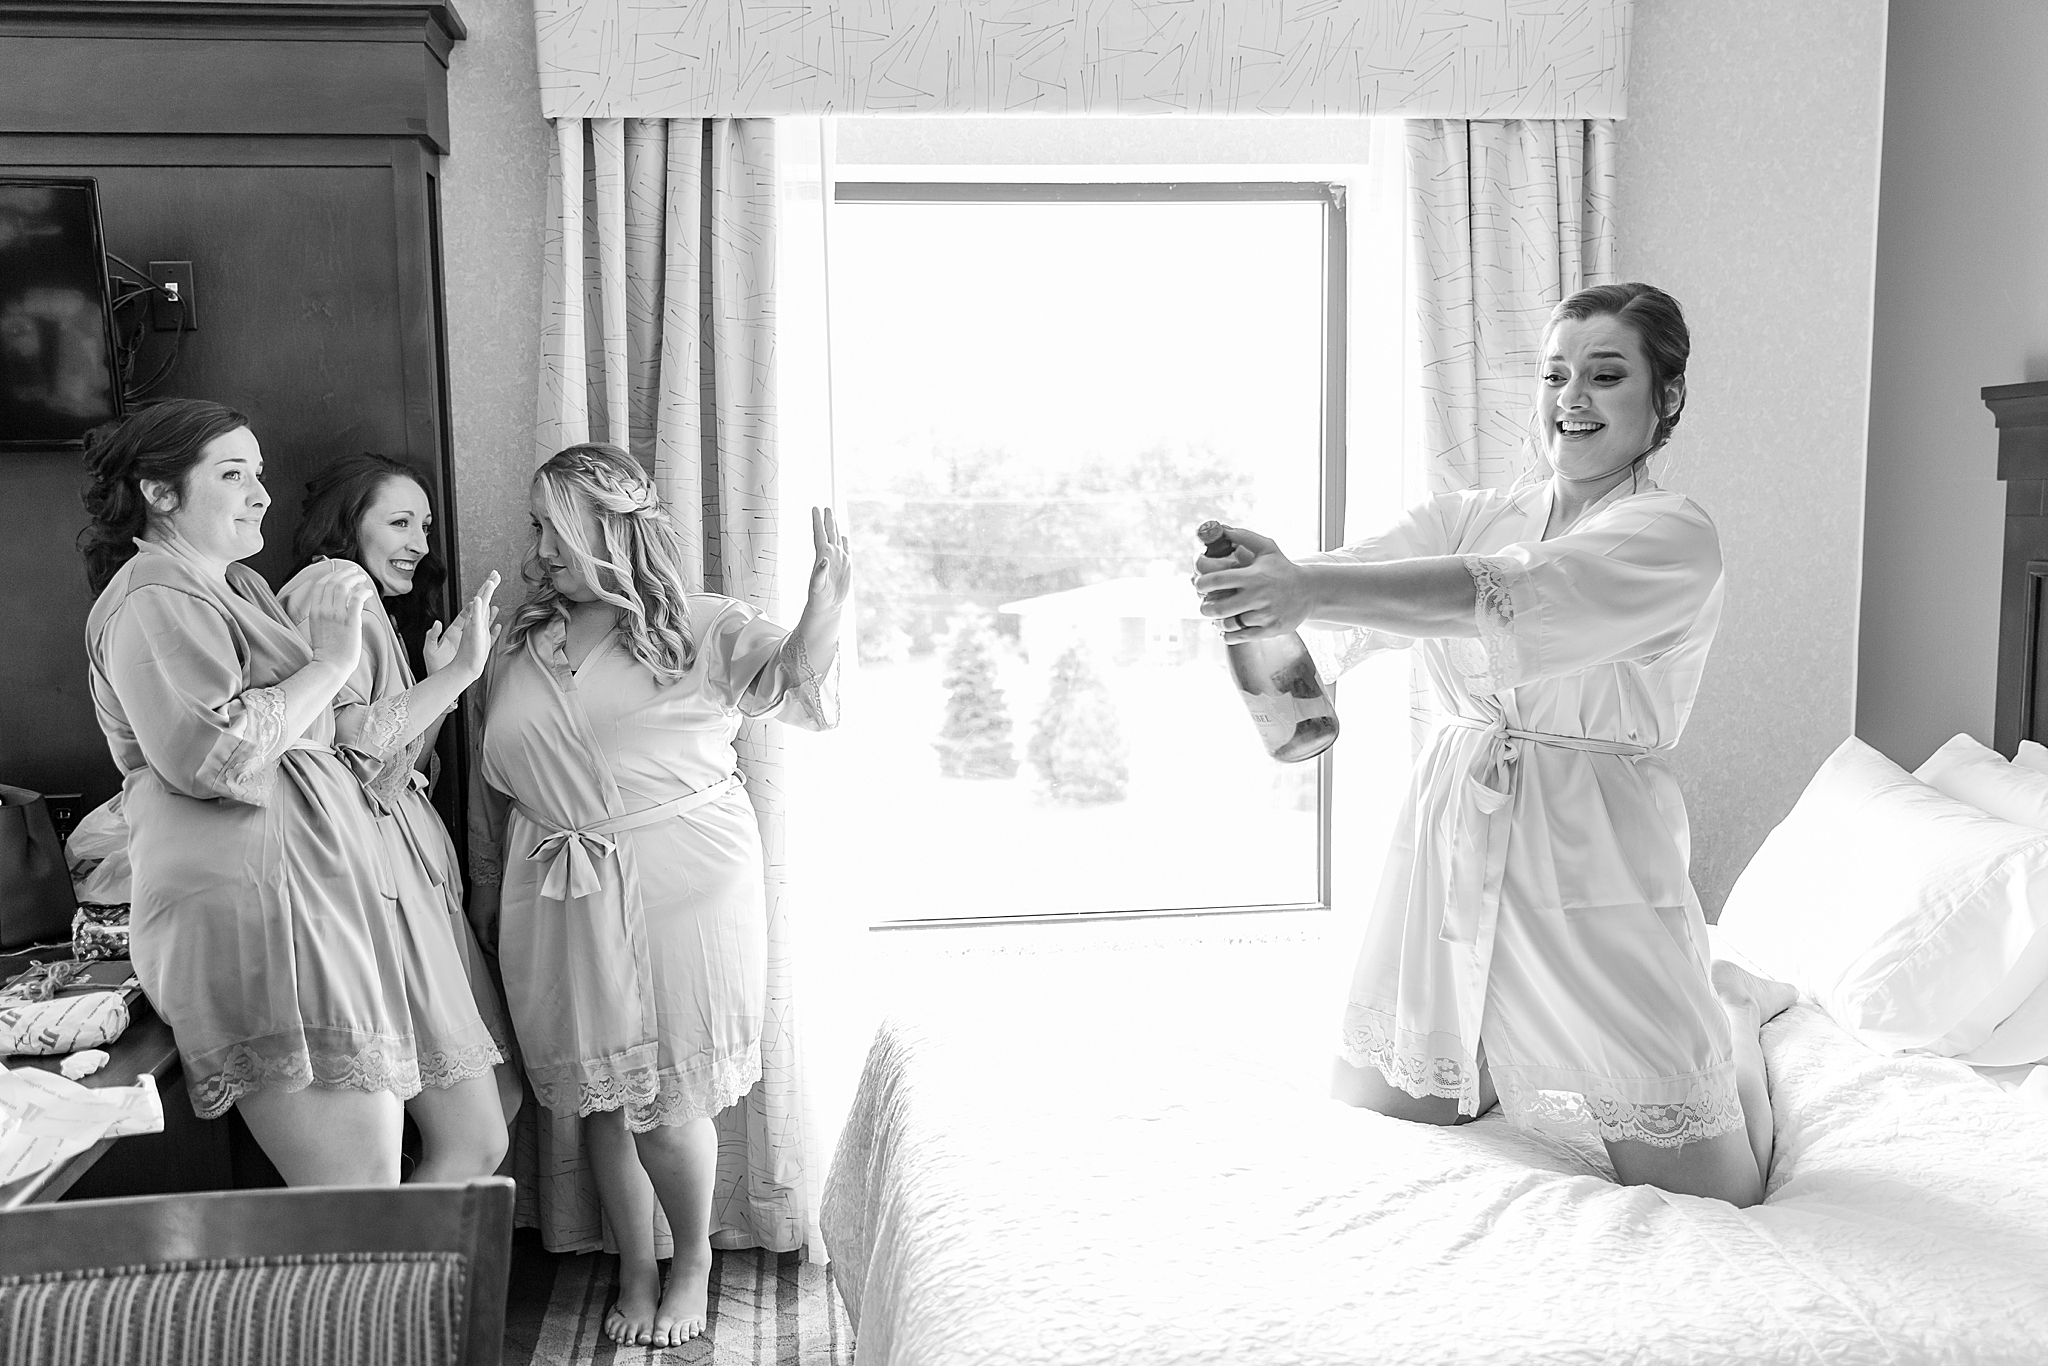 detroit-wedding-photographer-brownstown-event-center-wedding-photos-sam-josh-by-courtney-carolyn-photography_0003.jpg